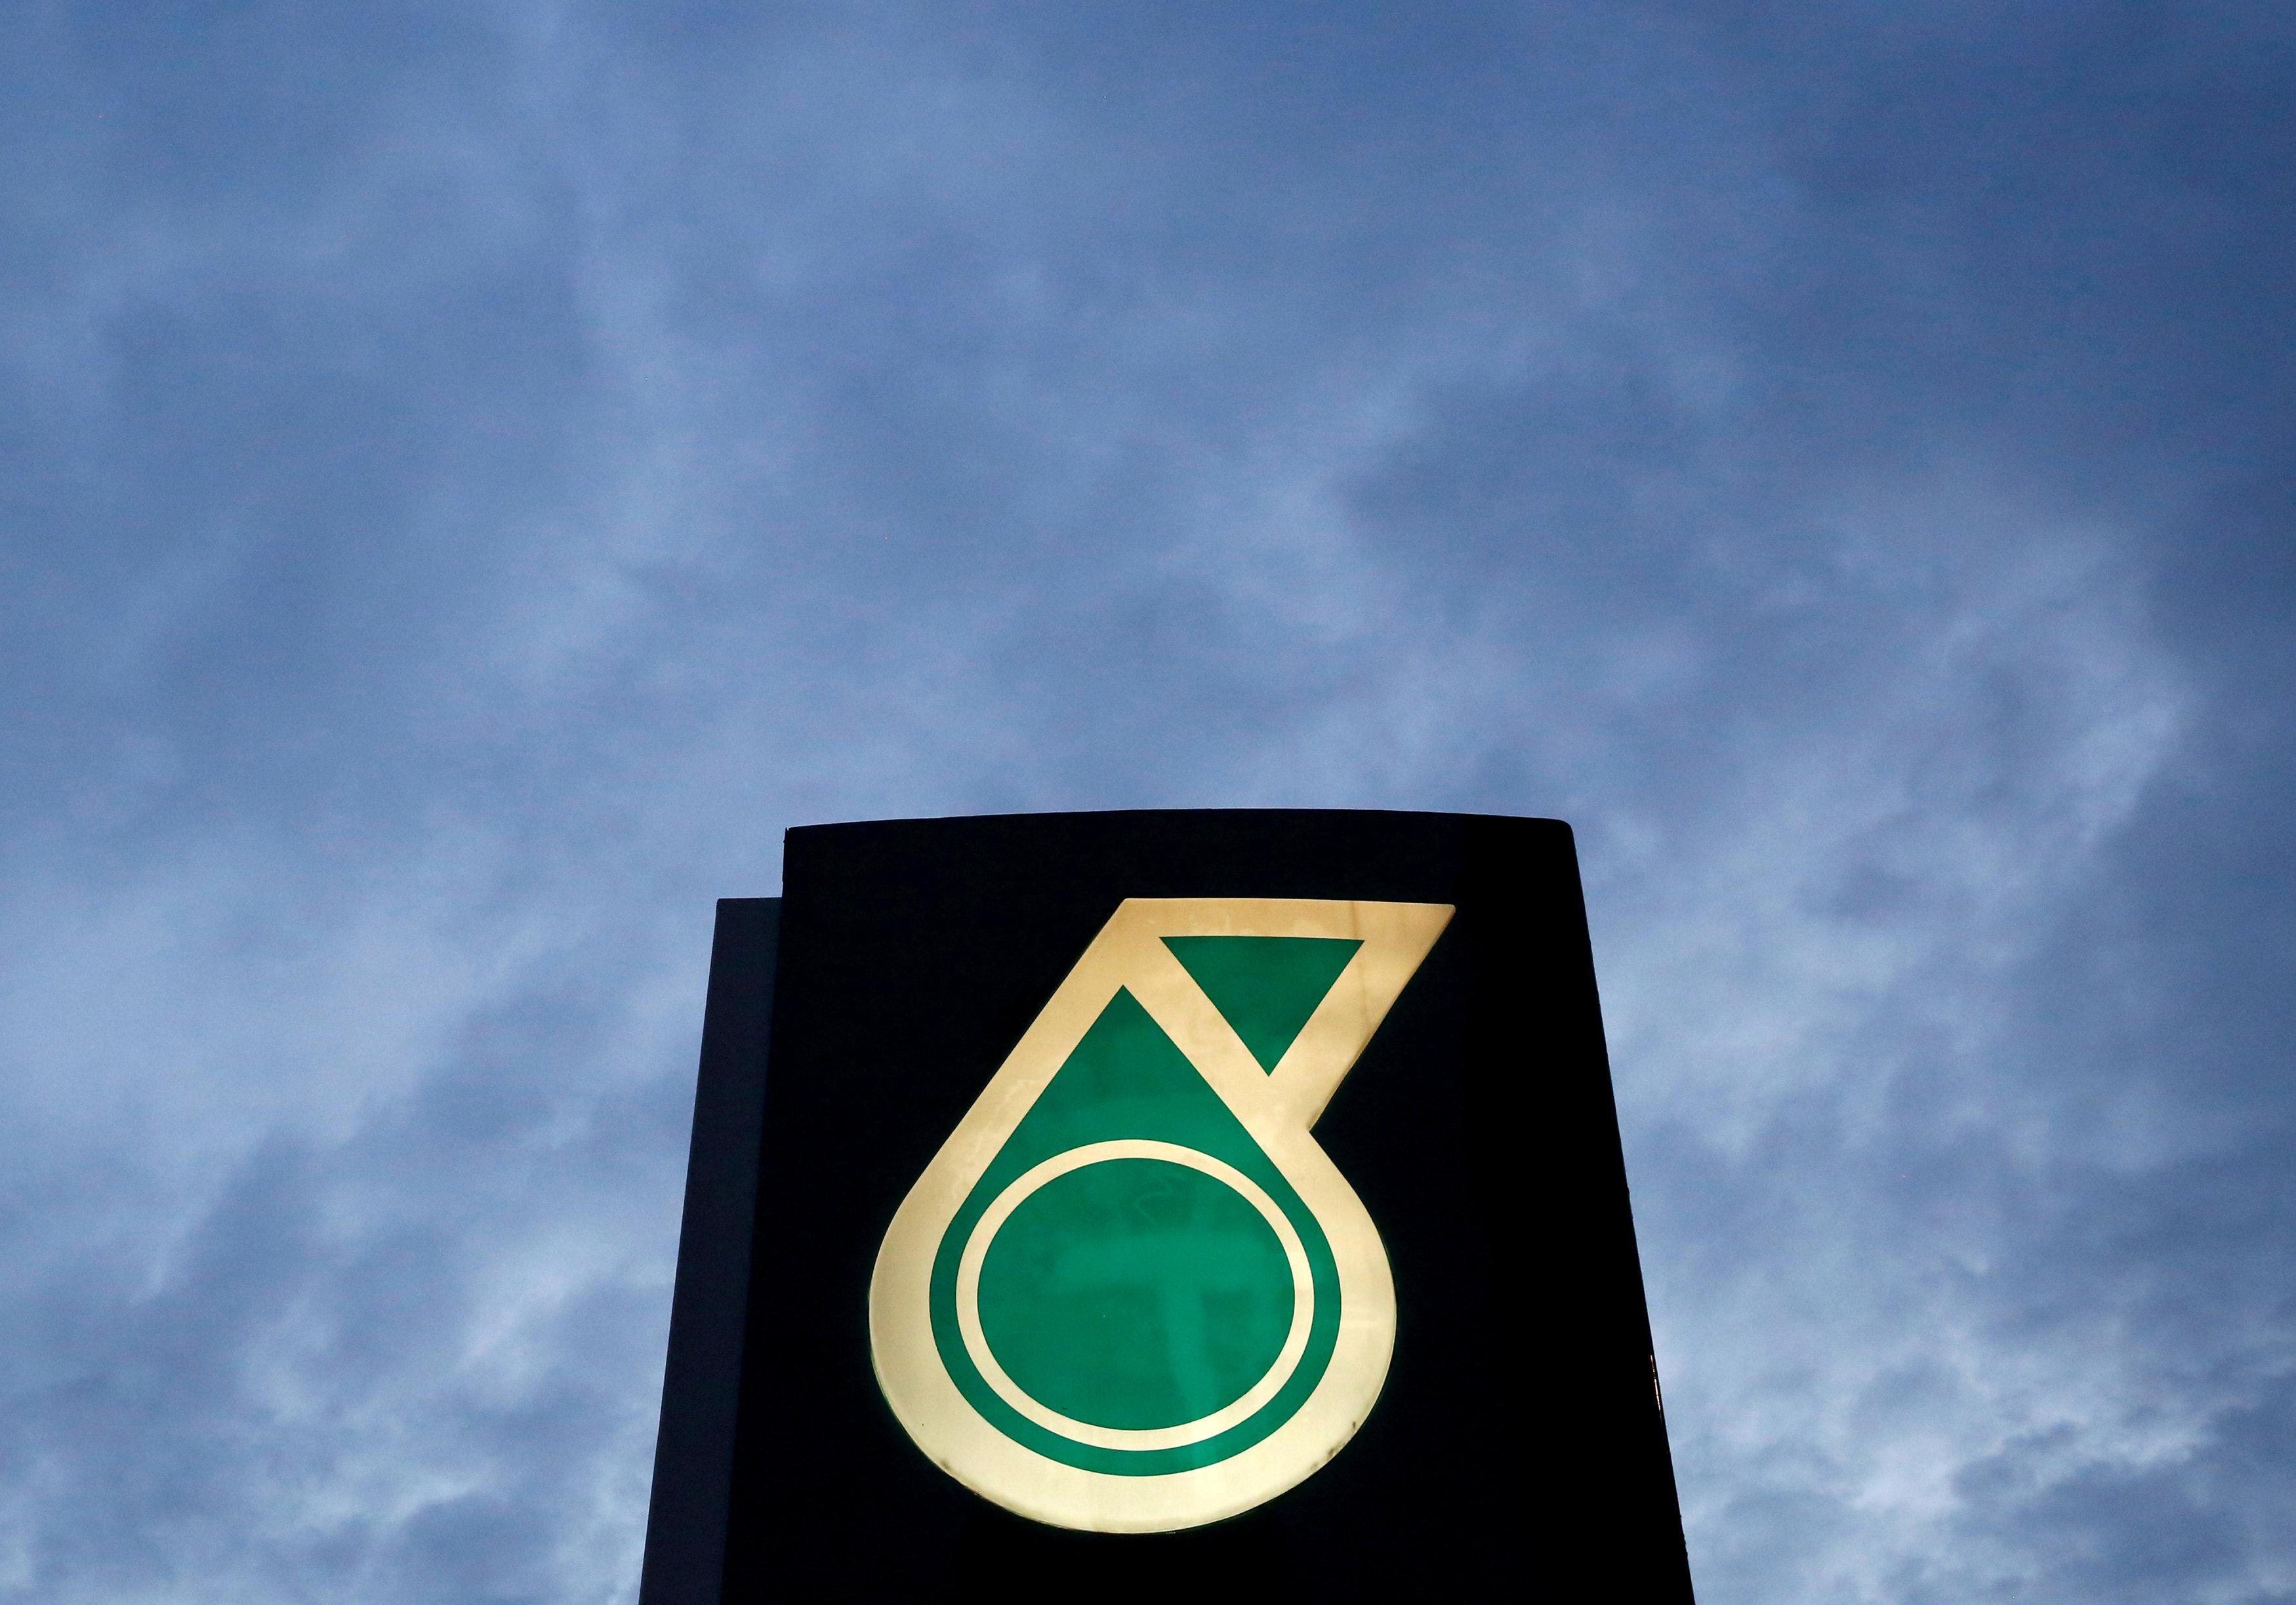 Worldwide gas glut claims $27 billion victim in Canada